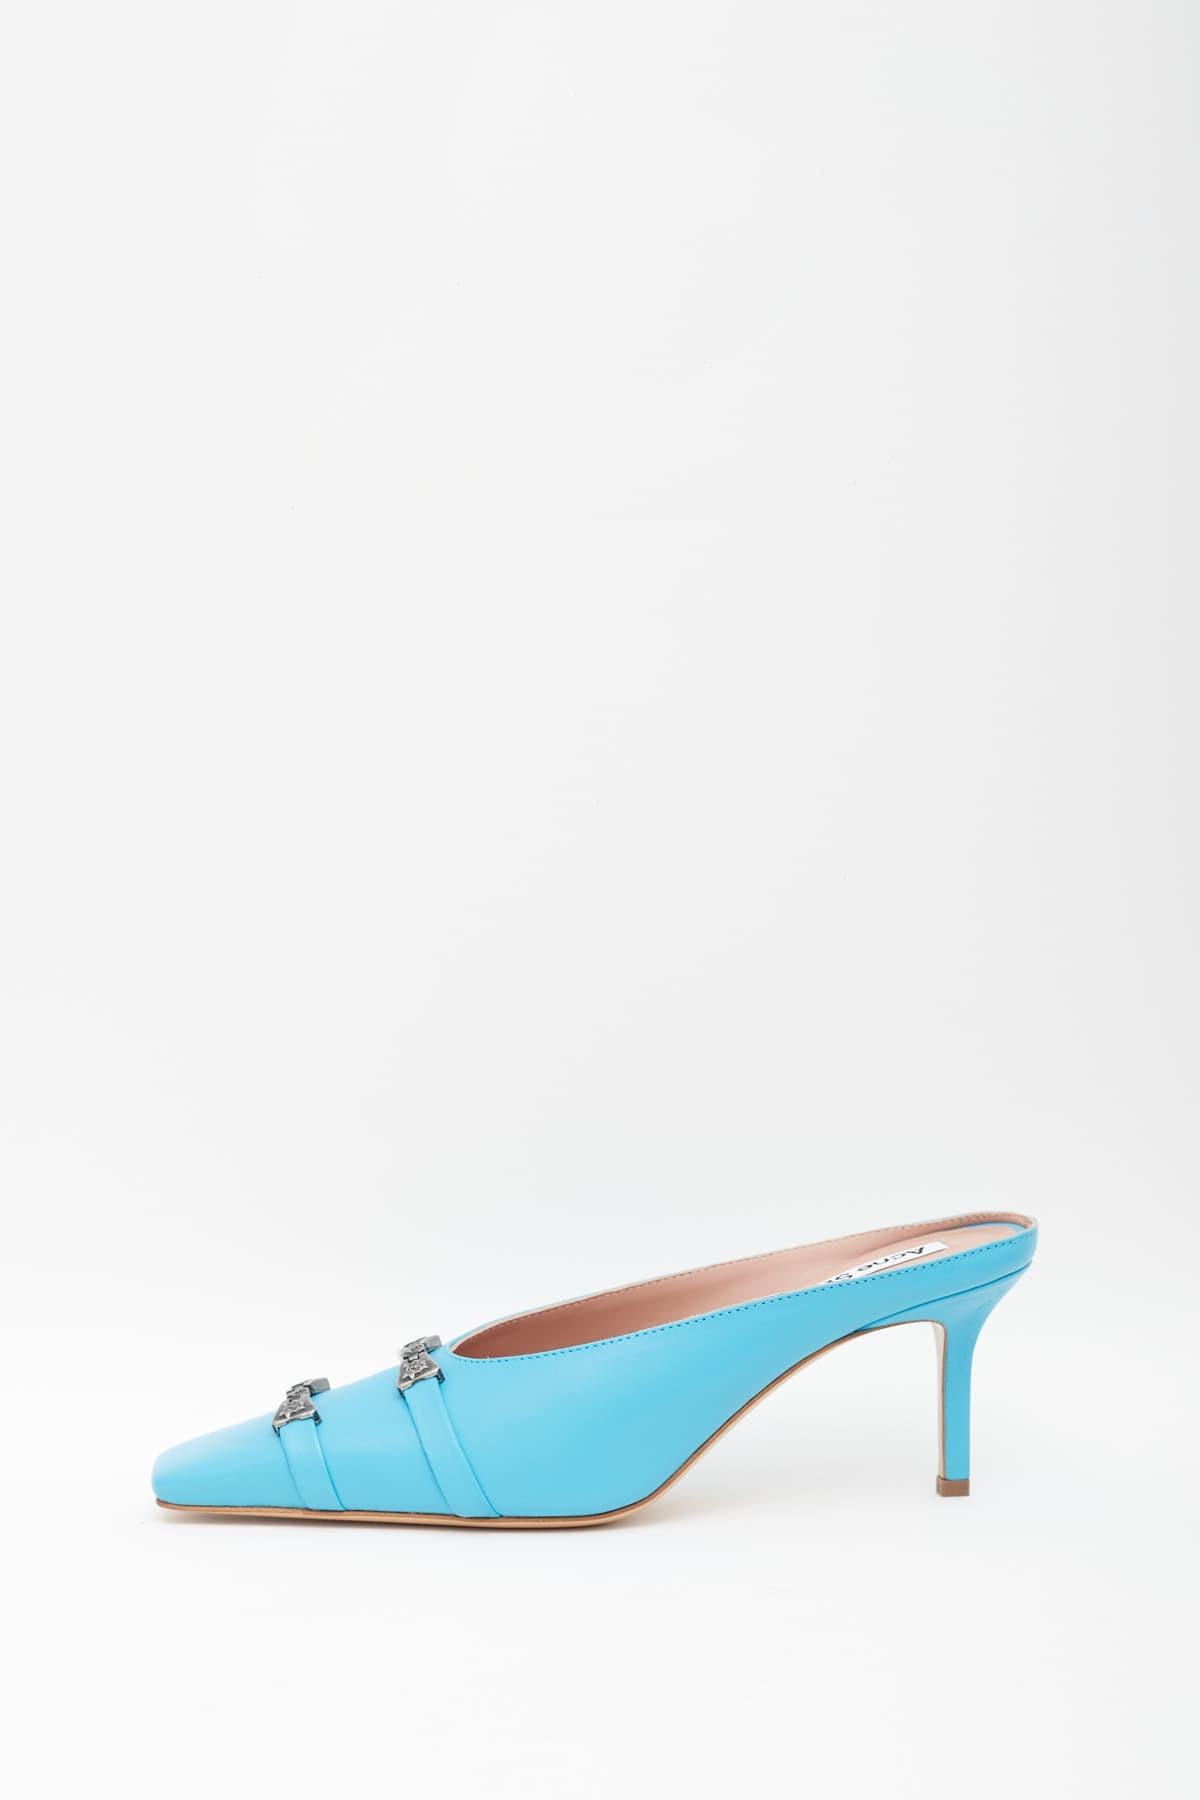 Comprar Acne Studios Black Misubi Midi Handbag